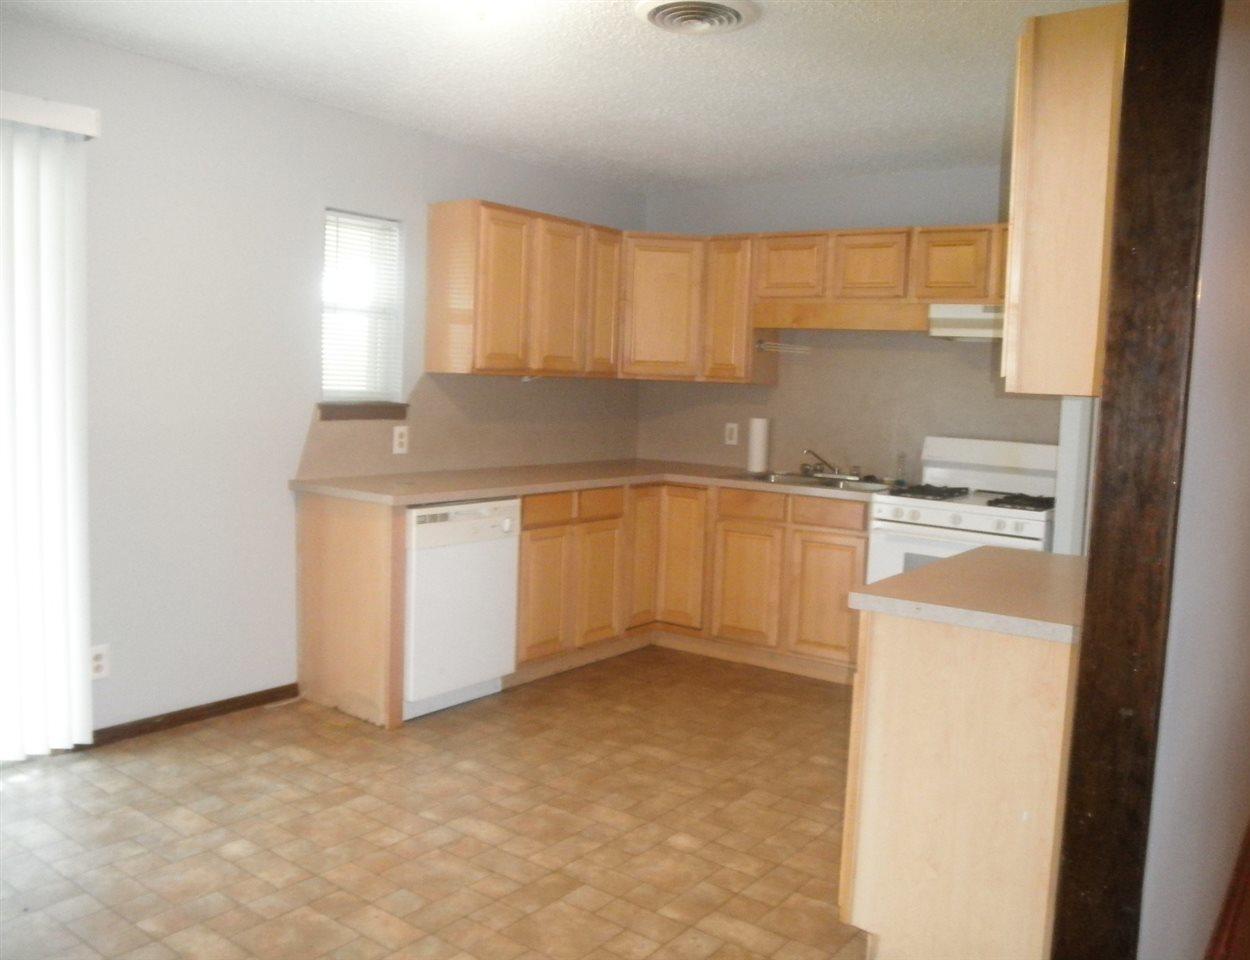 Sold Intraoffice W/MLS | 1209 N Ash Ponca City, OK 74601 3